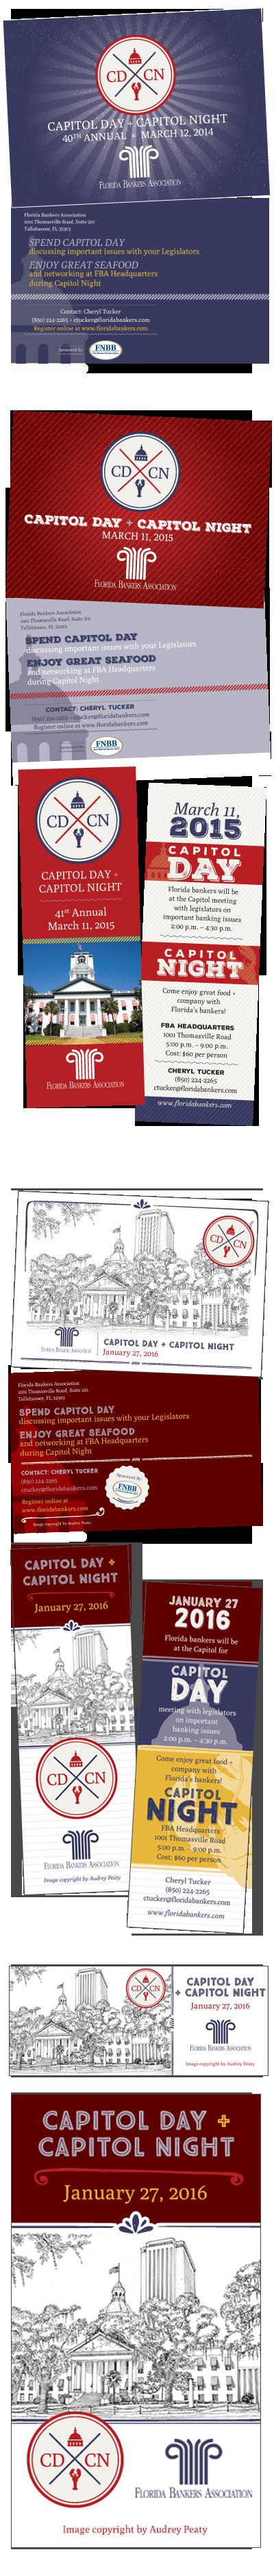 Event marketing for Florida Bankers Association.